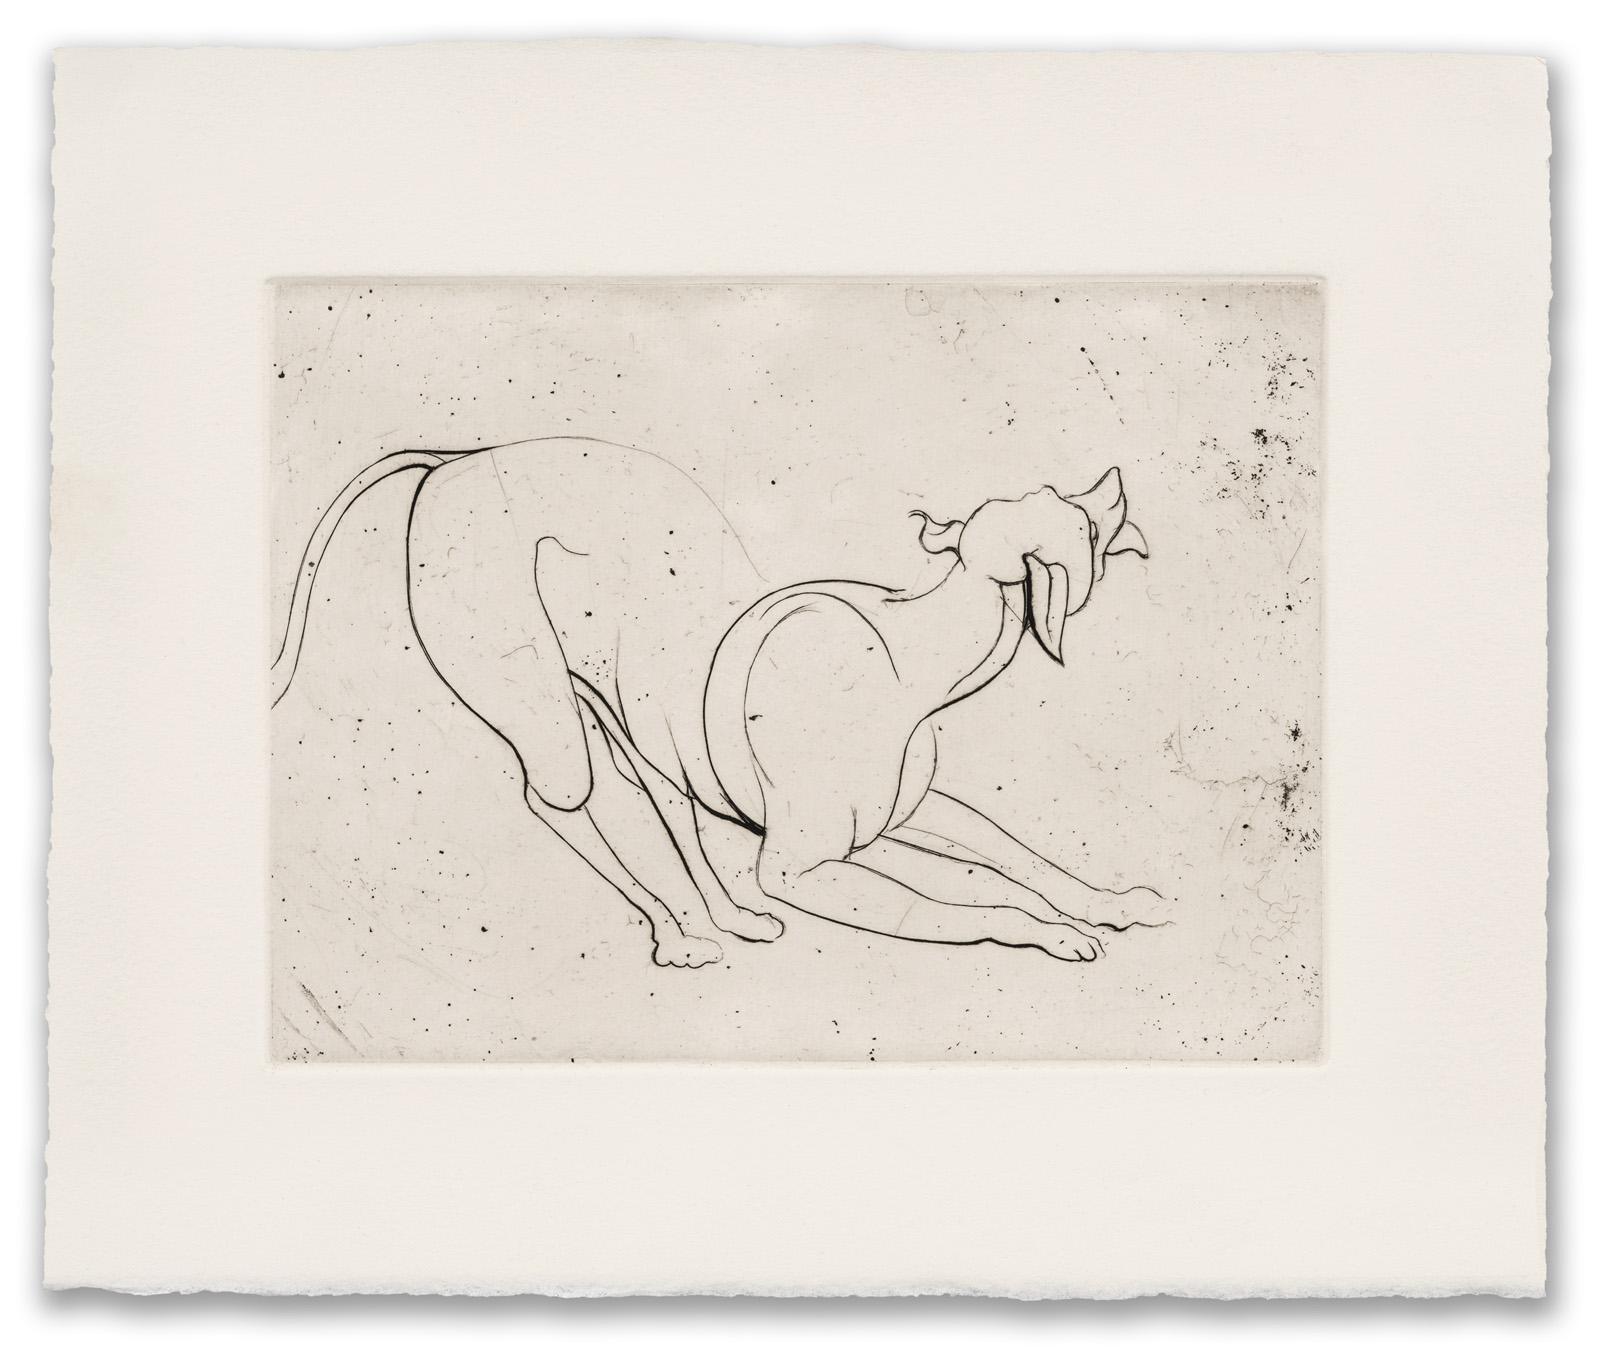 Francis West, (British 1936-2015), Crouching Dog, c.1979 (2017 Edition).